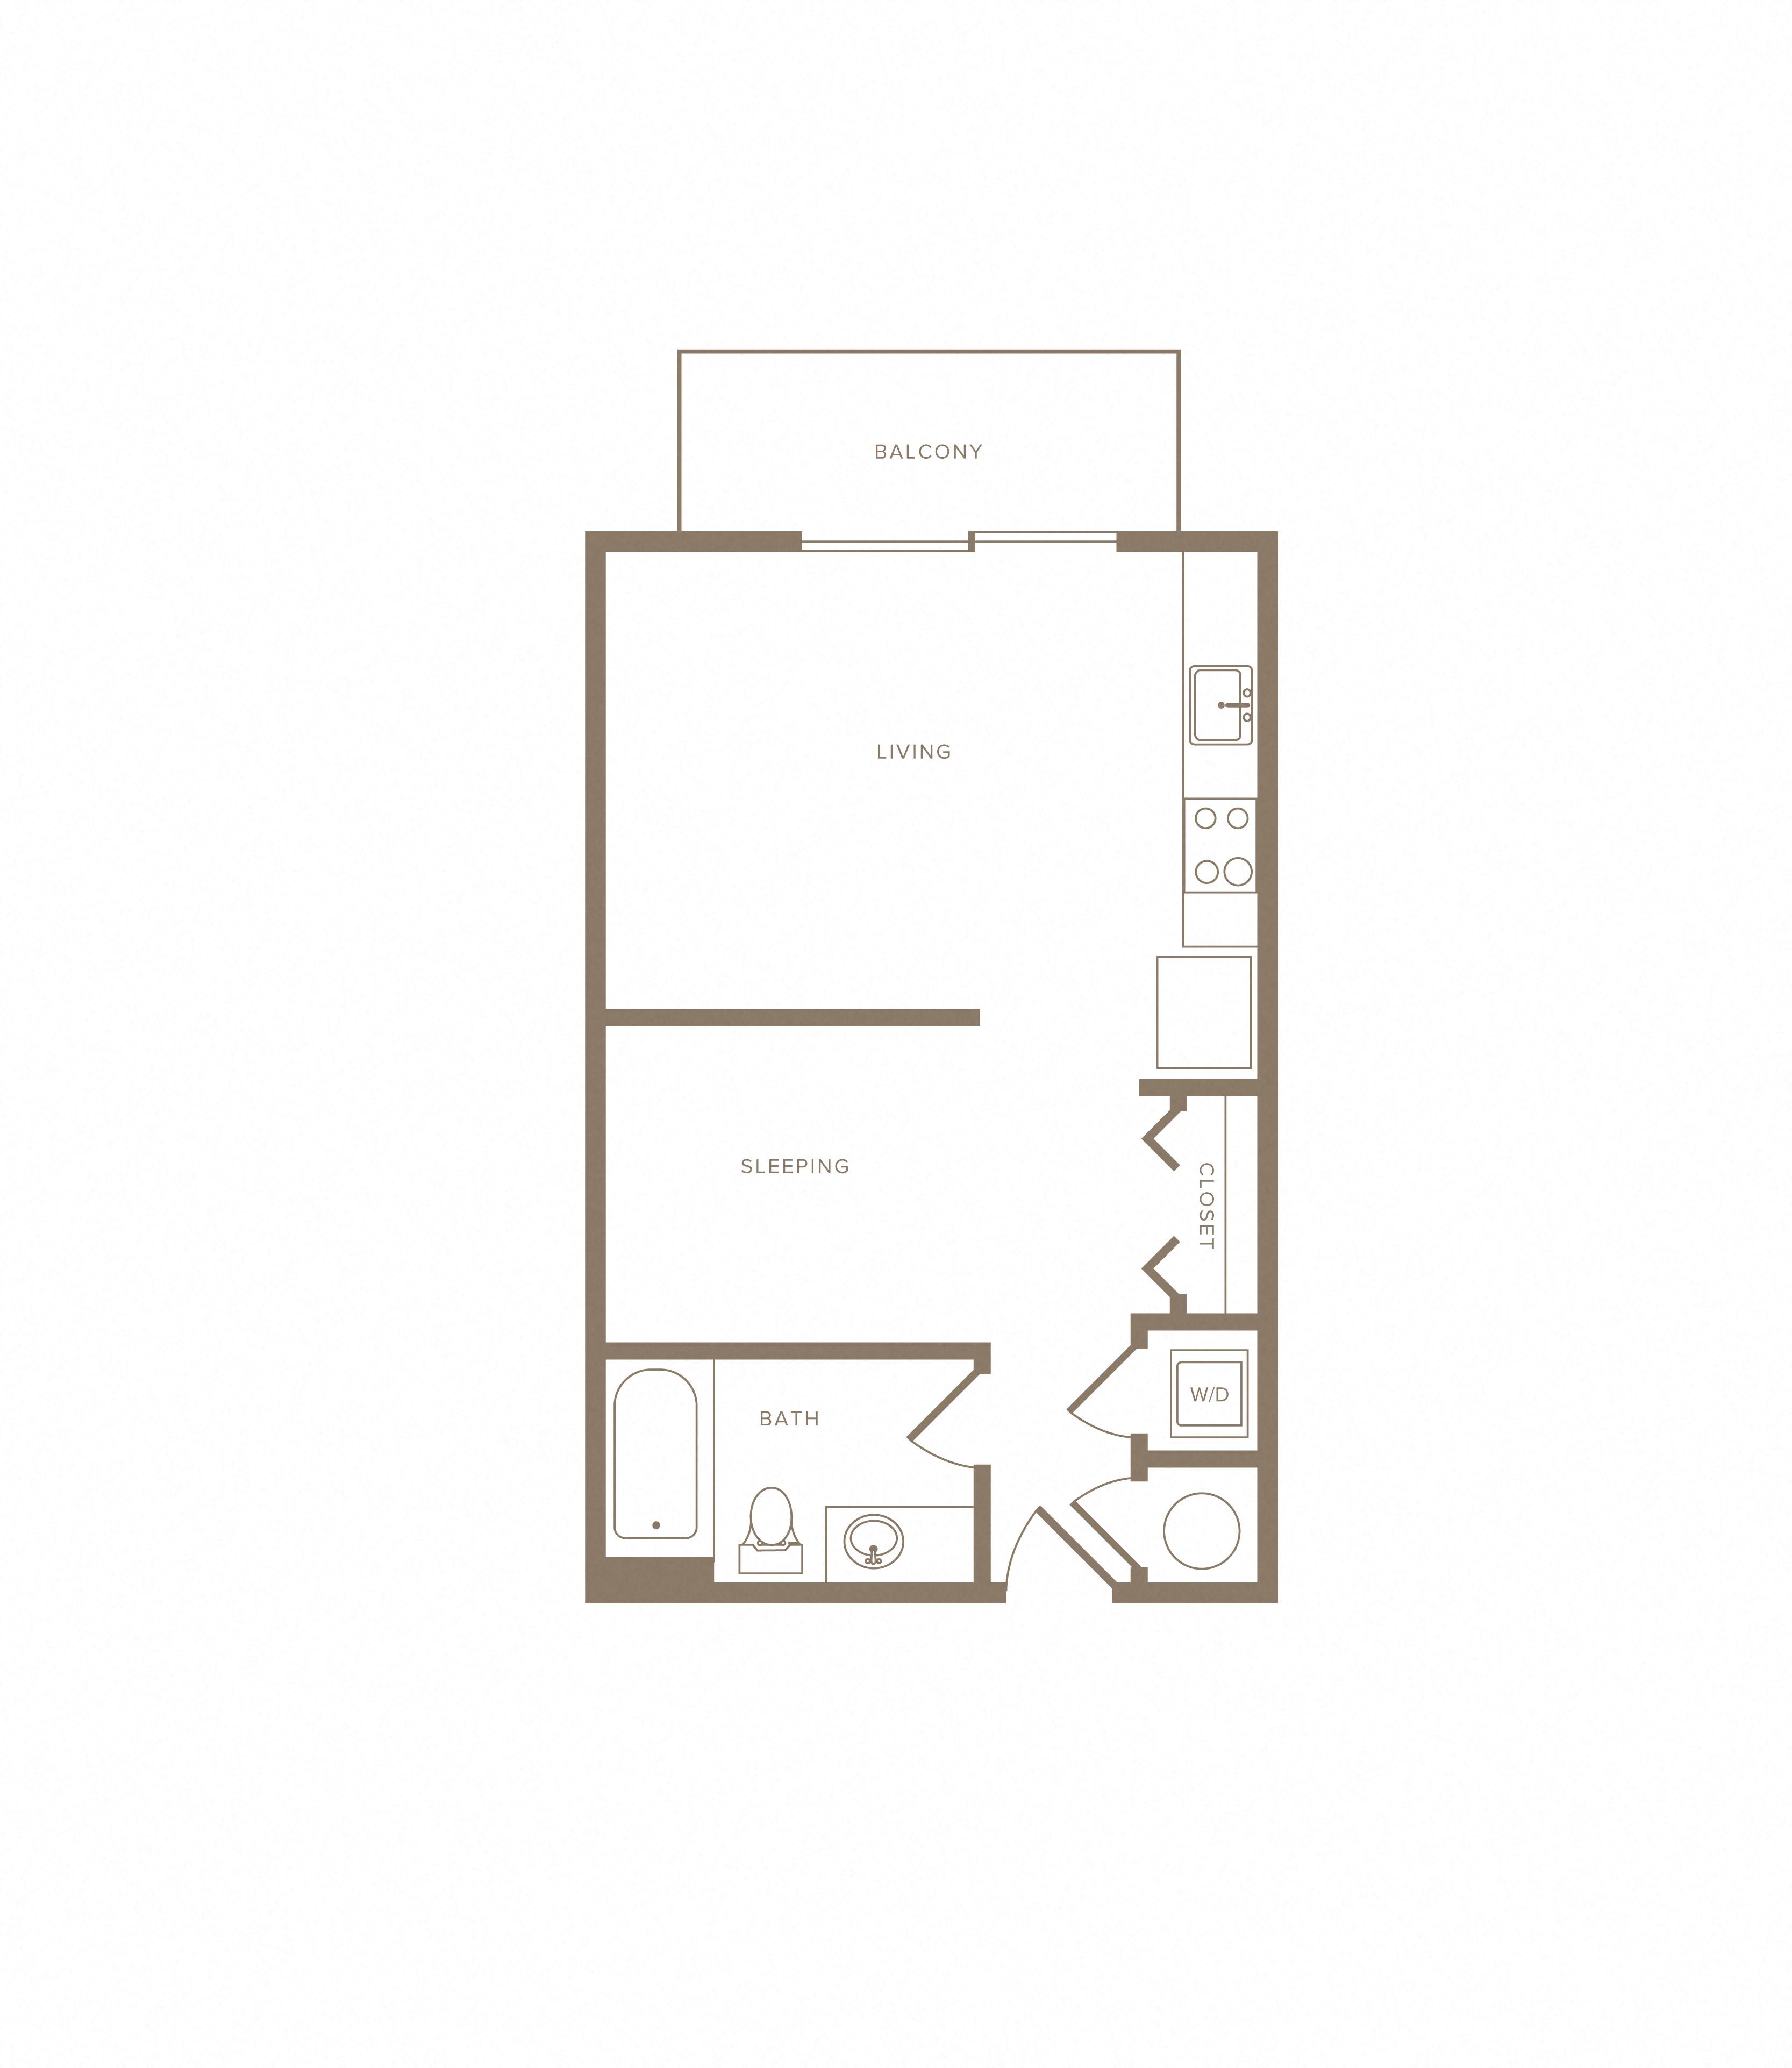 Apartment E-820 floorplan